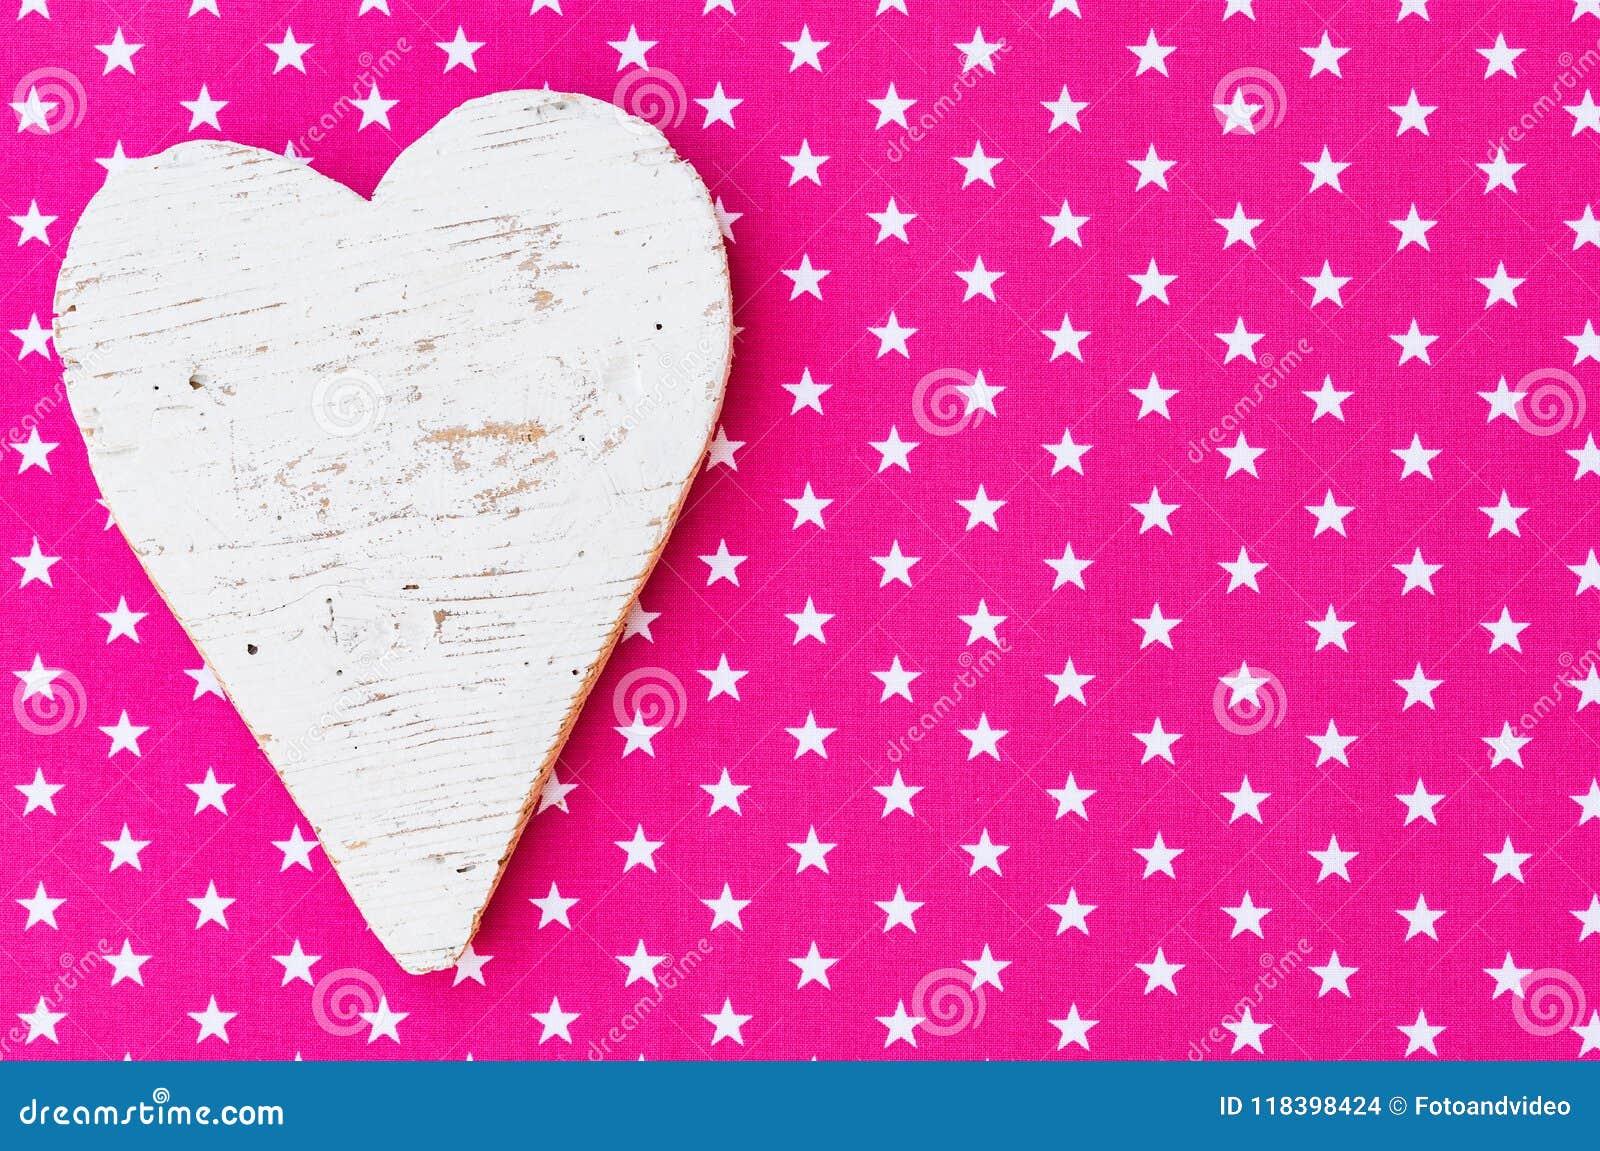 Baby girl birthday greeting card pink background with heart stock baby girl birthday greeting card pink background with heart m4hsunfo